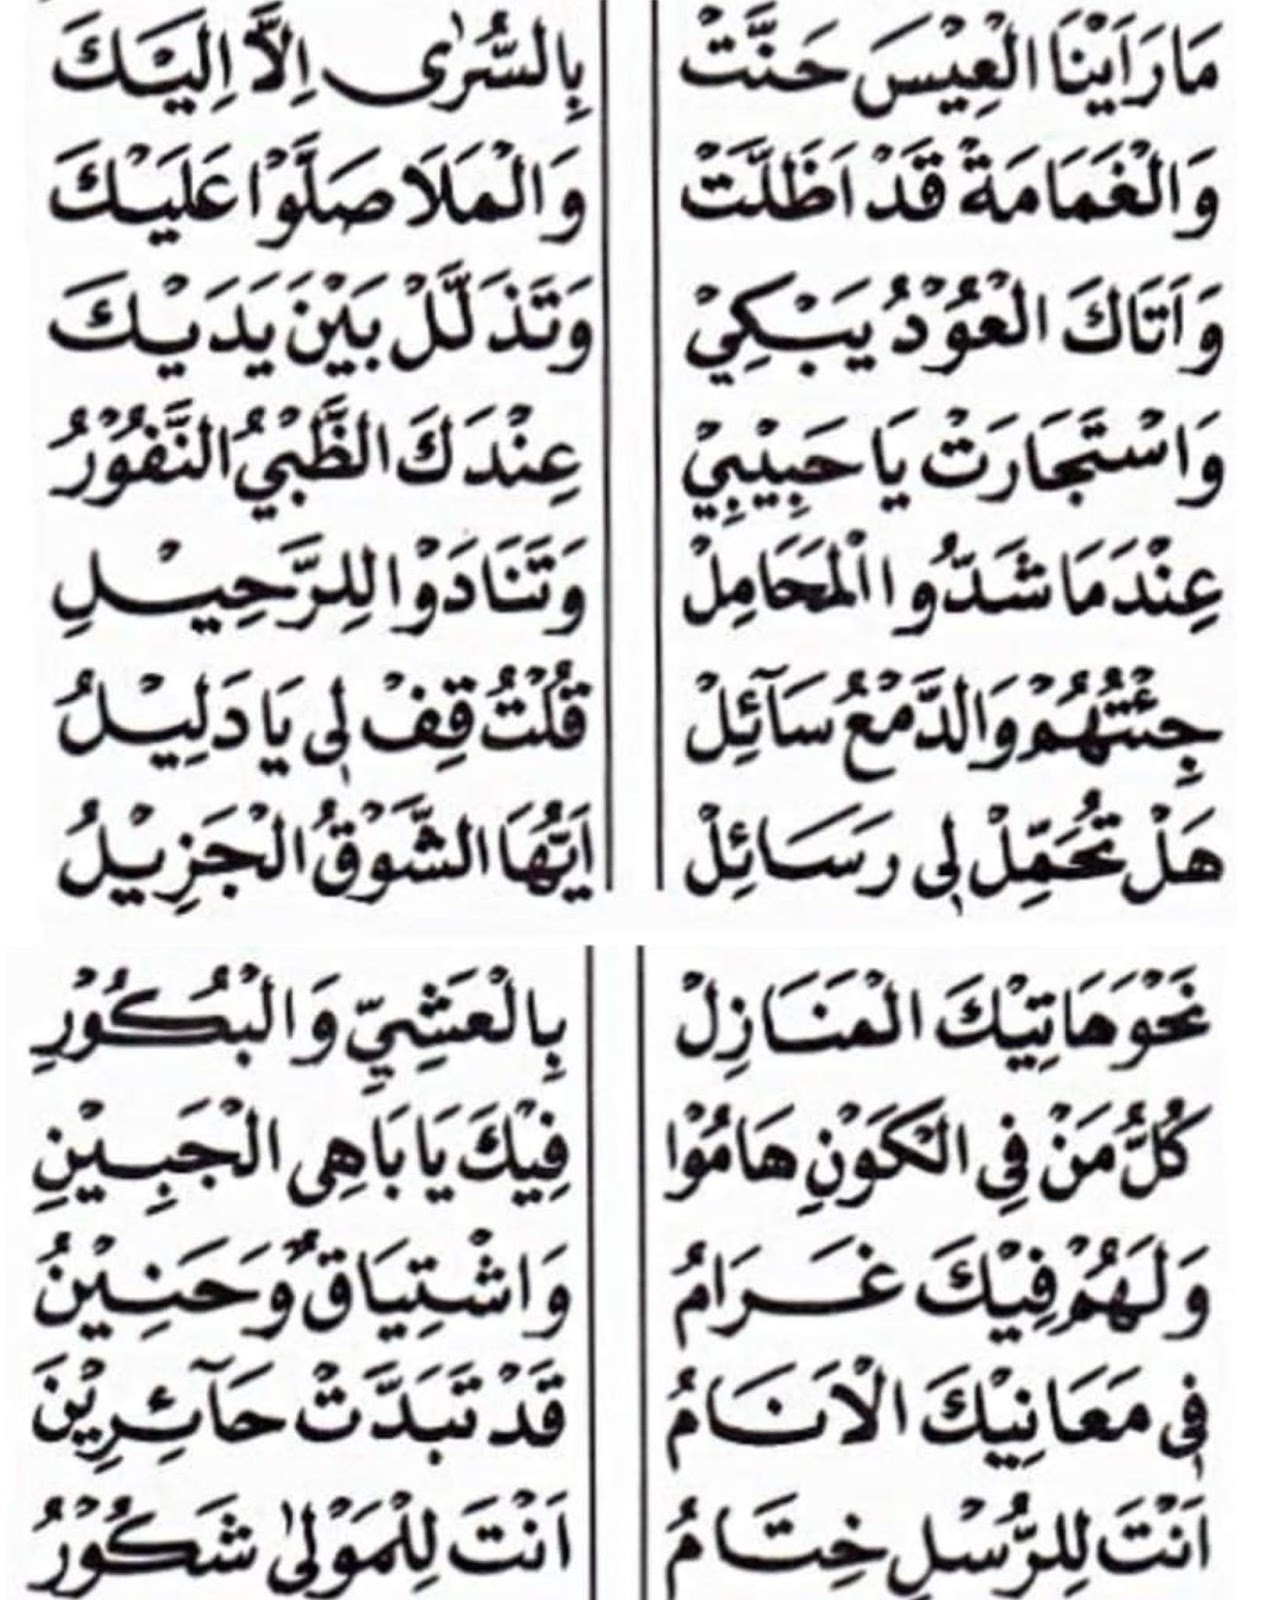 Teks Mahalul Qiyam Lengkap : mahalul, qiyam, lengkap, Sholawat, Mahalul, Qiyam, Lirik